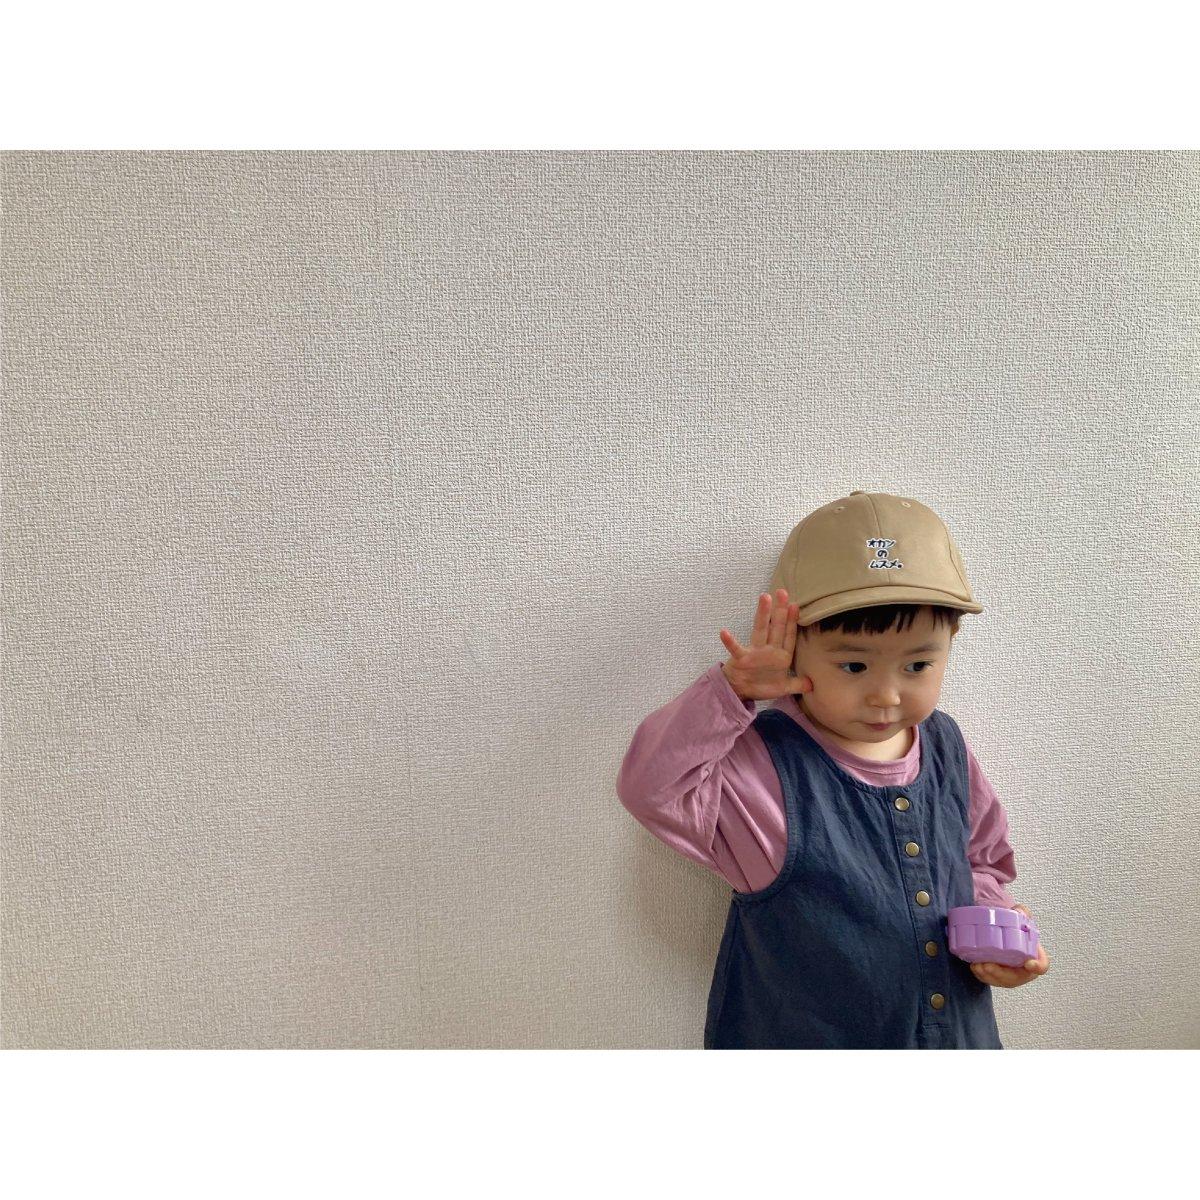 O2M2 Kids Shisyu Cap 詳細画像28